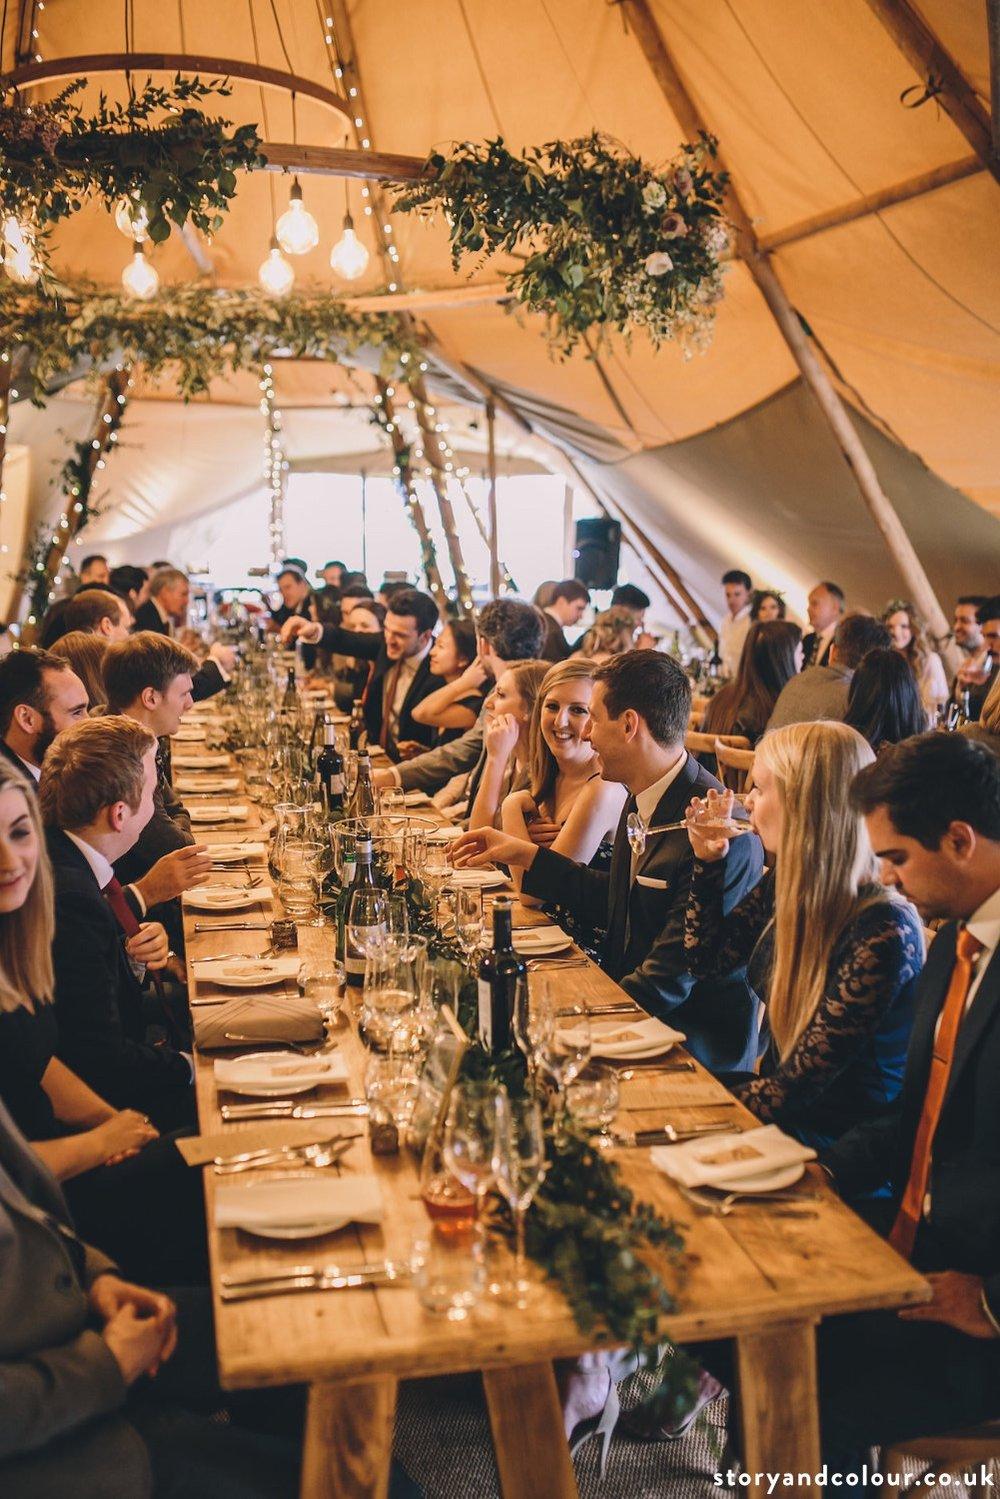 Buffalo_Tipi_wedding_hire_wiltshire.jpg